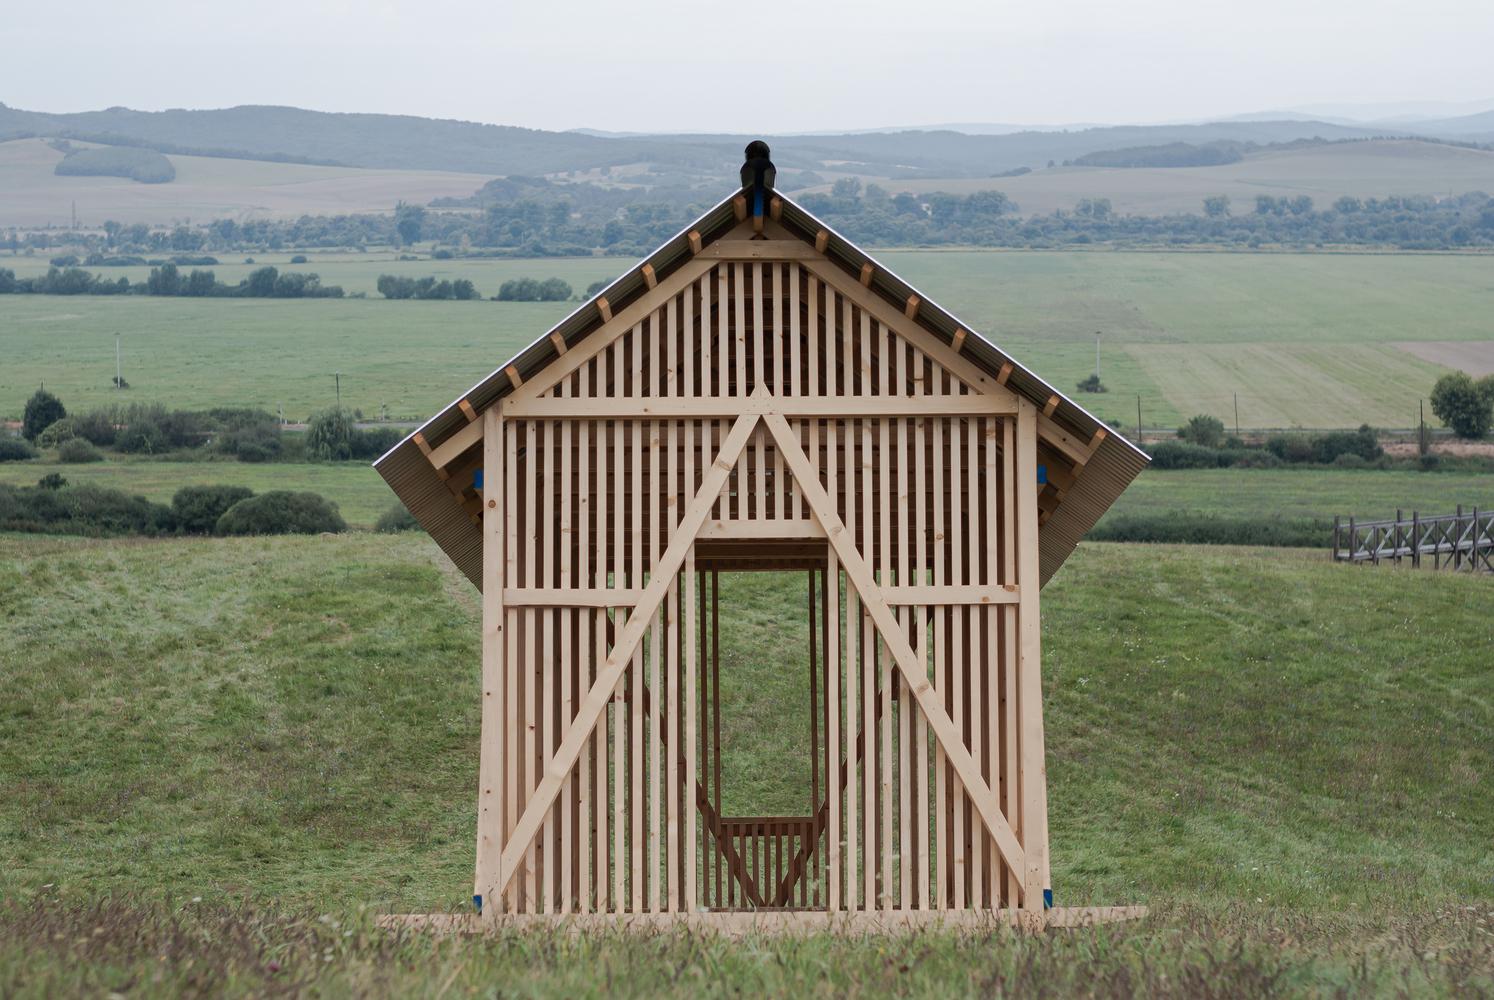 Slanted House / Paradigma Ariadné